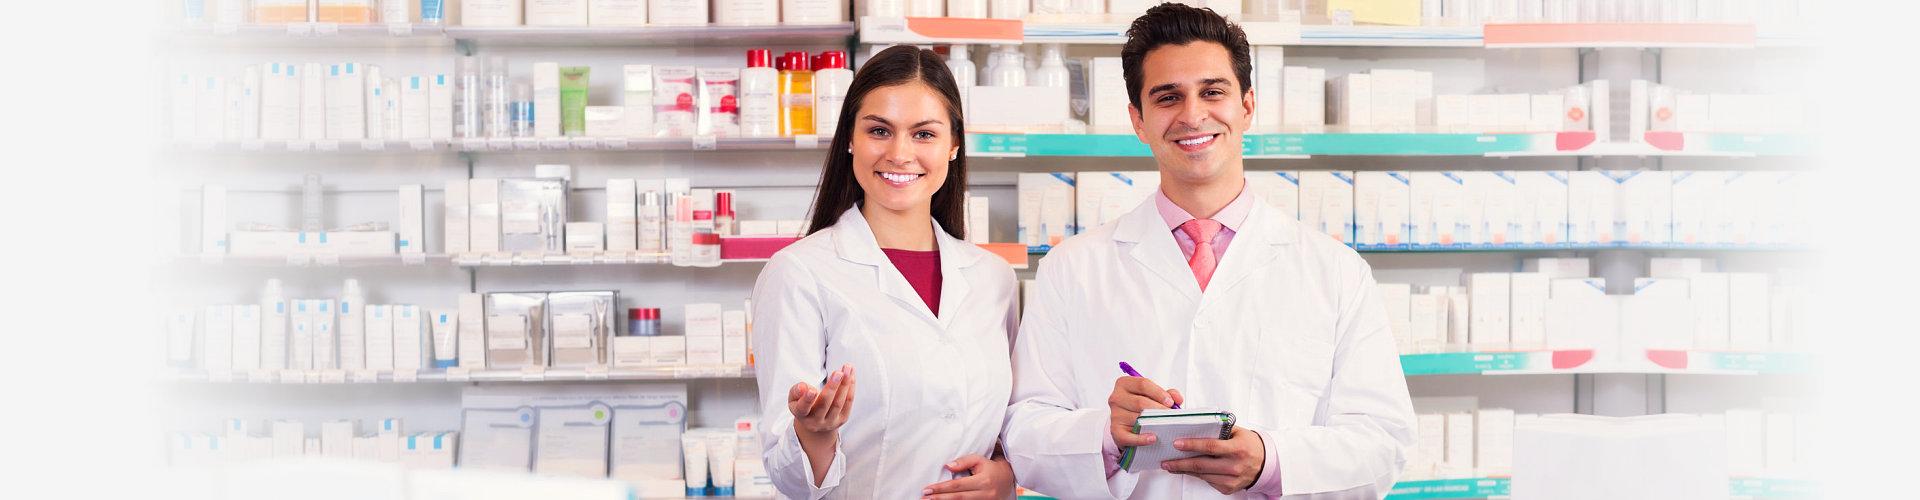 pharmacist and pharmacy technician